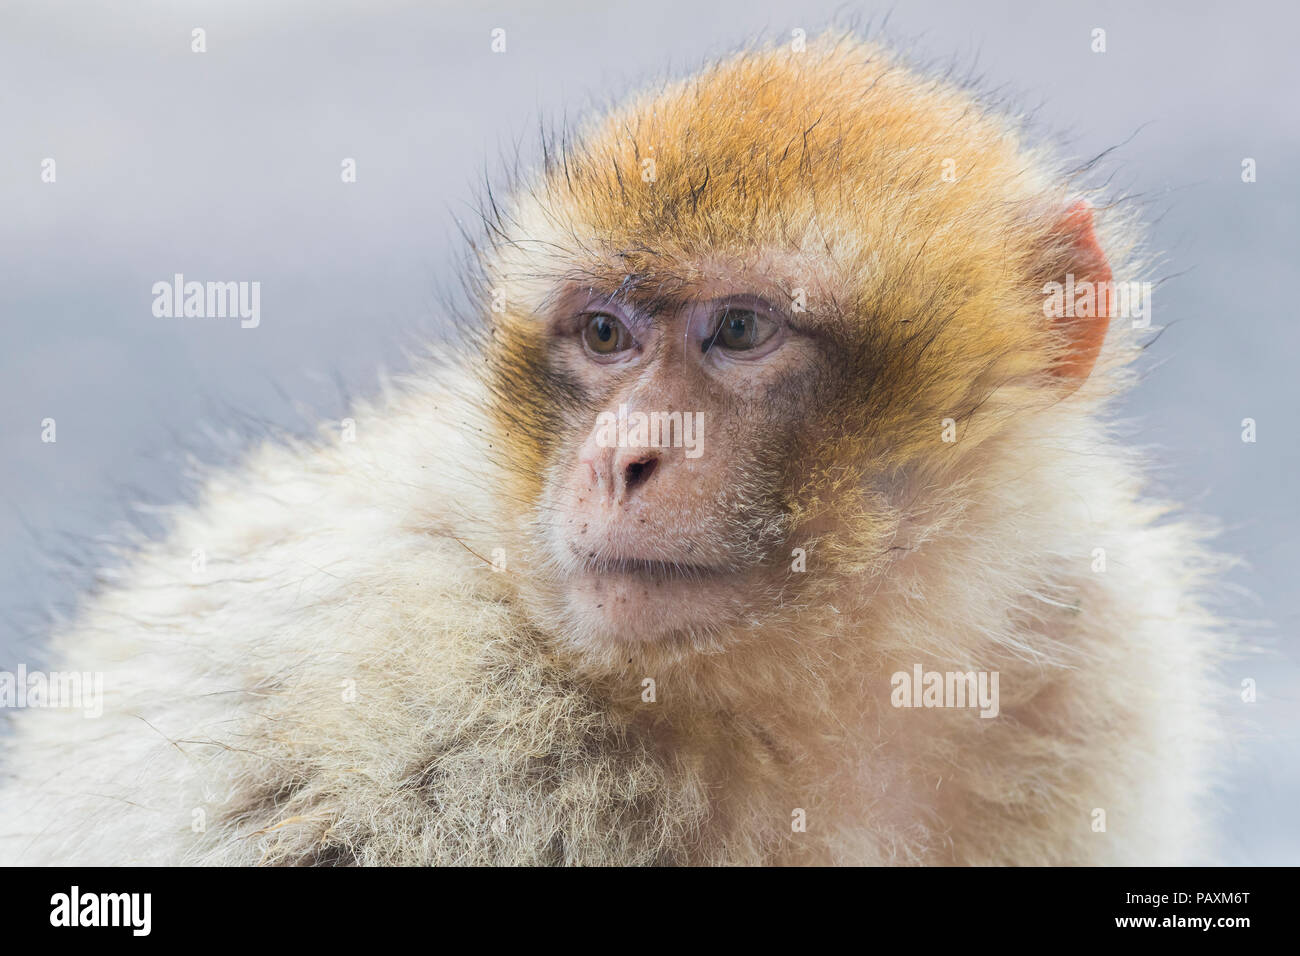 Barbary Macaque (Macaca sylvanus), juvenile close-up - Stock Image